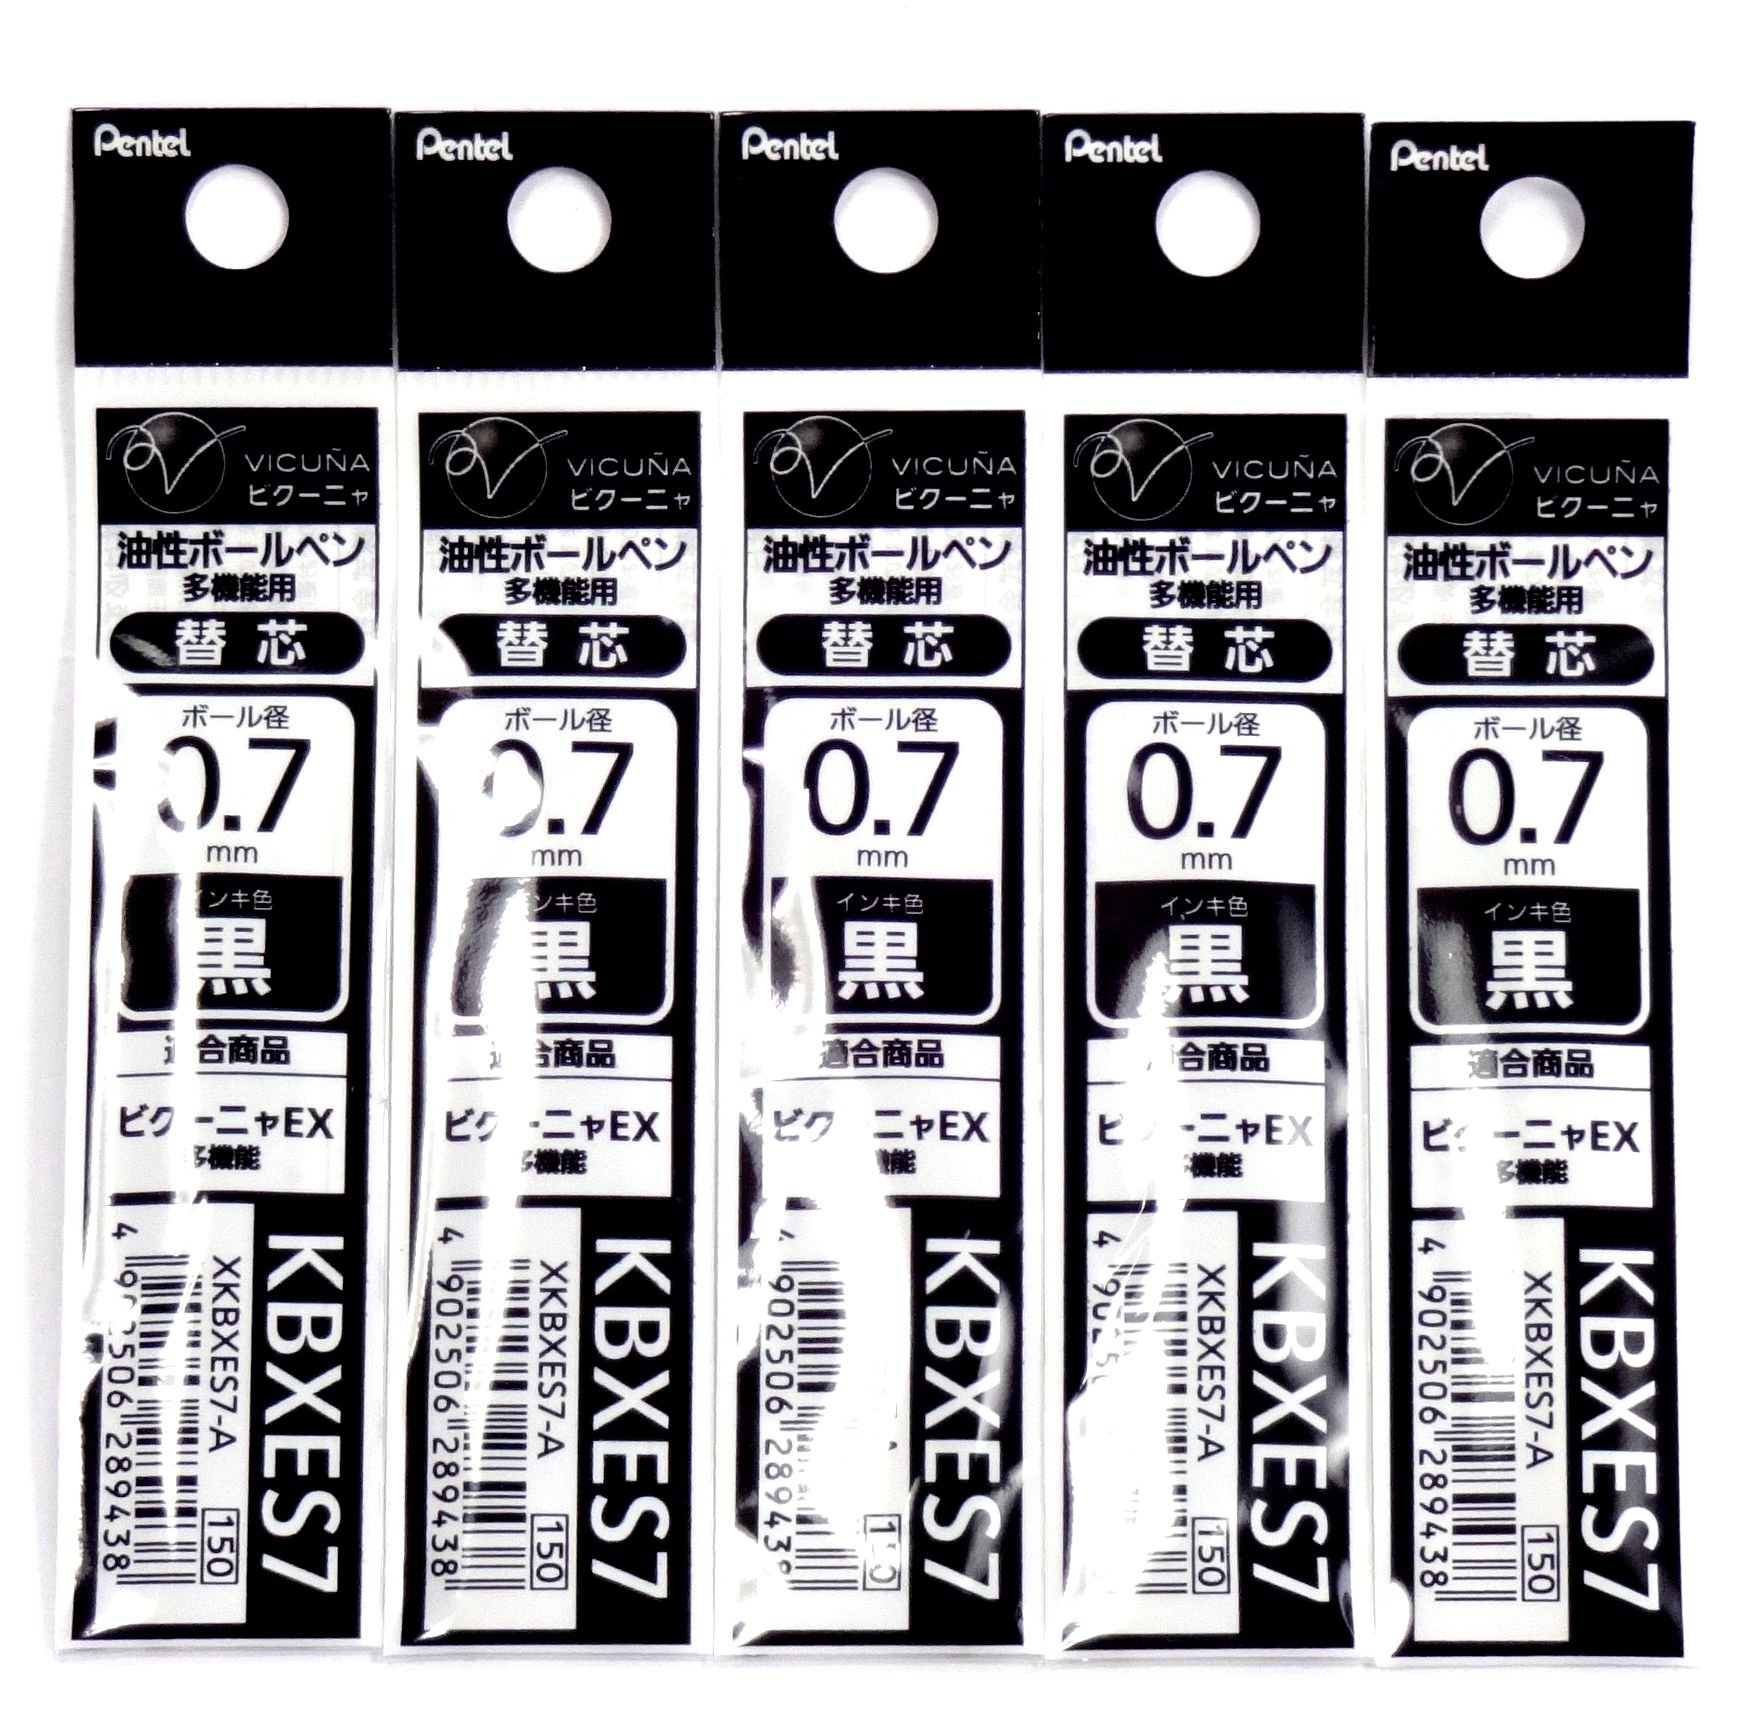 Pentel VICUNA EX 1 2+1 Multi Function Pen BXW1375A Black Body